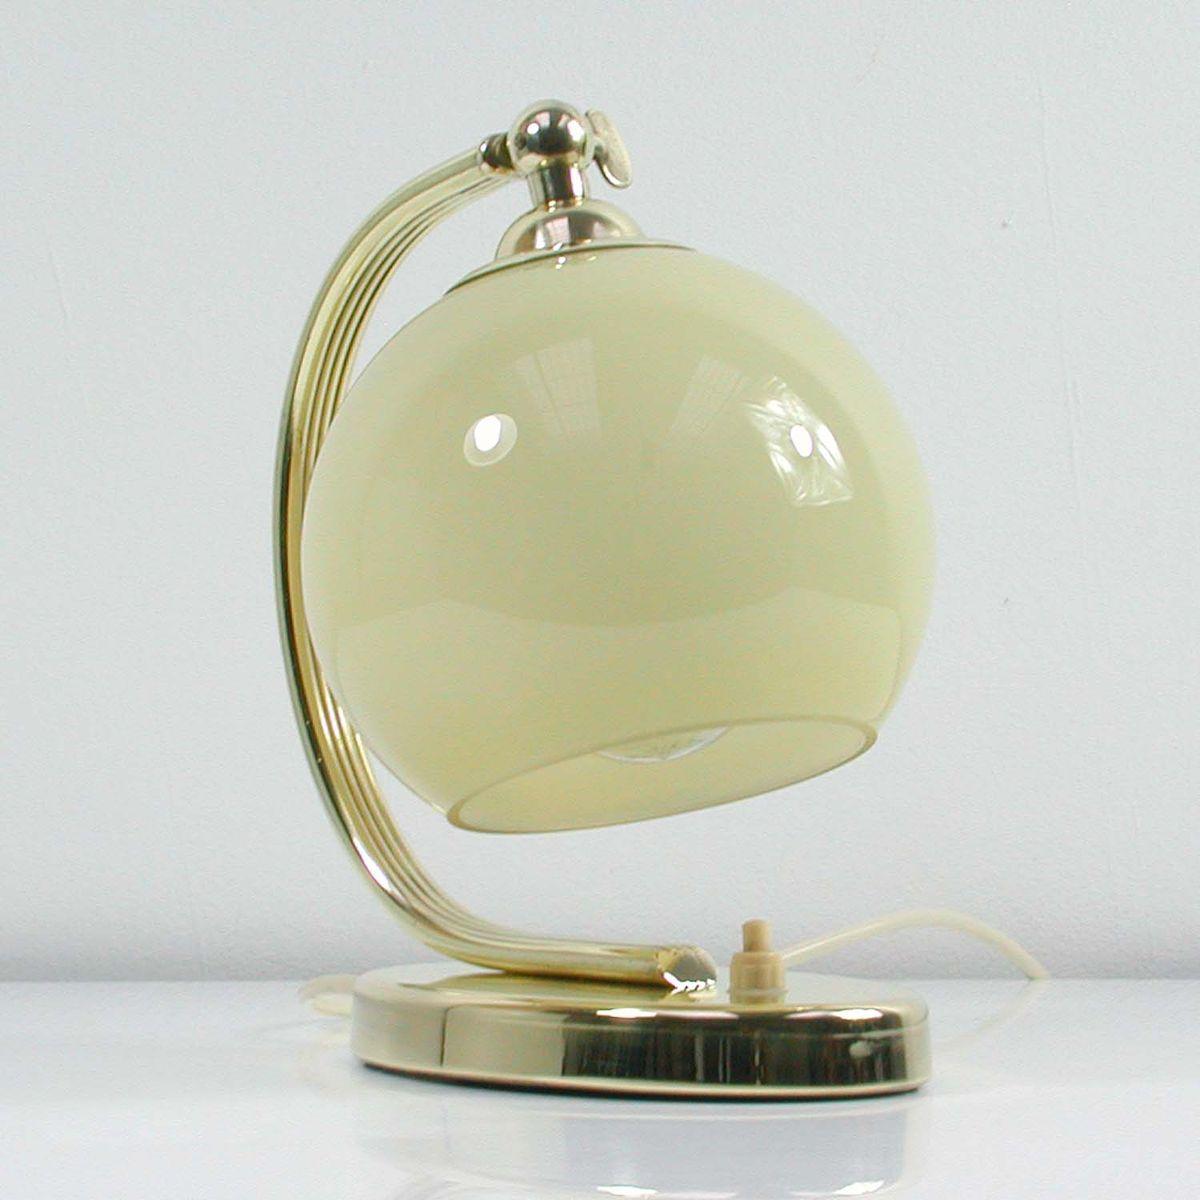 german art deco bauhaus brass table lamp 1930s for sale at pamono. Black Bedroom Furniture Sets. Home Design Ideas